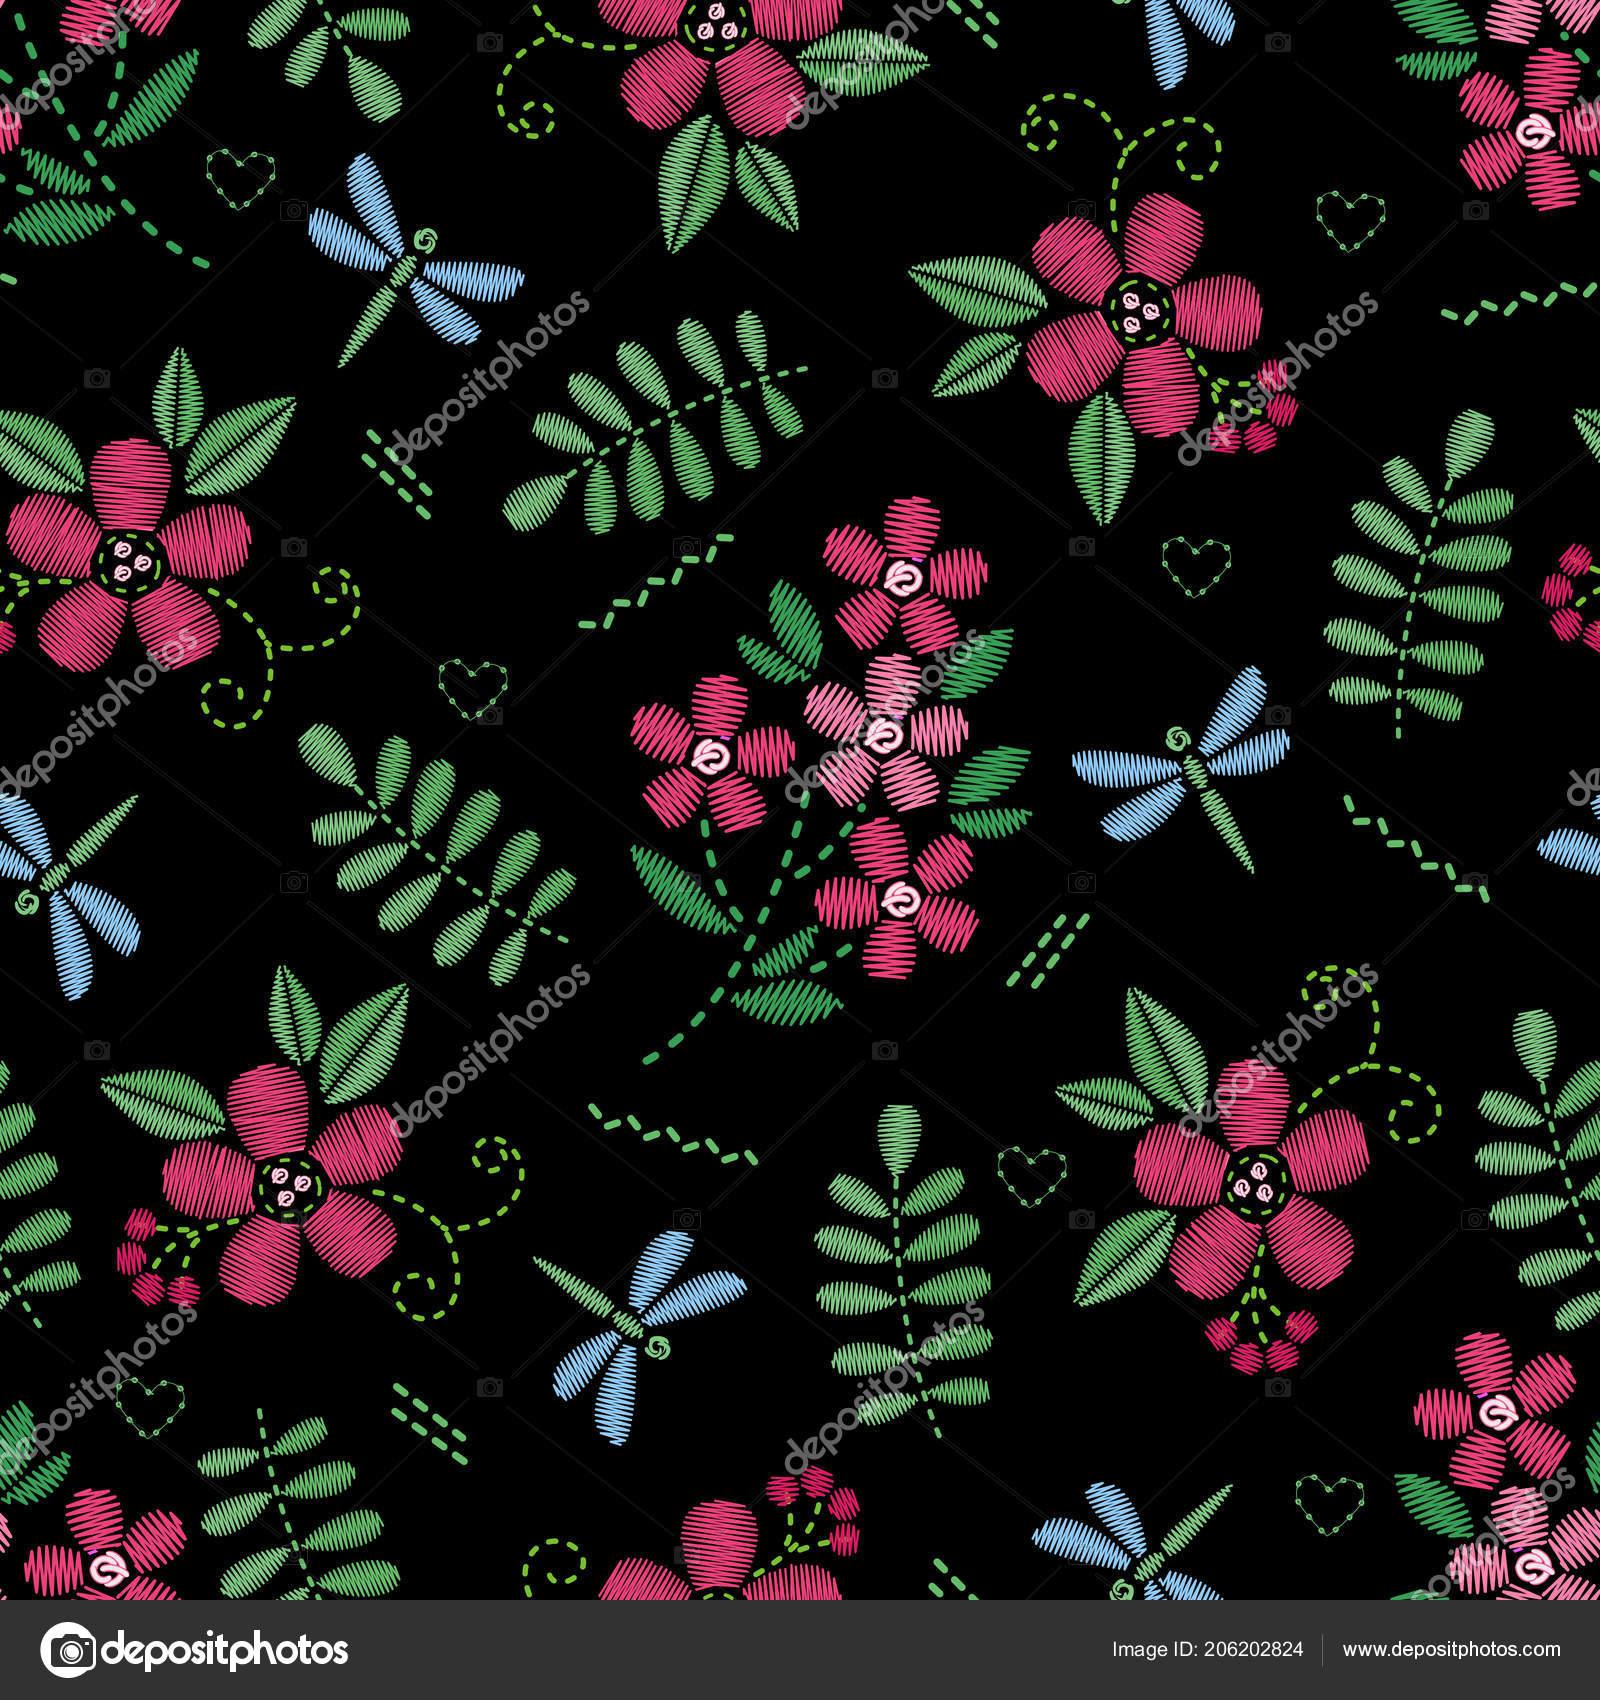 Patrón transparente bordado con flores. Ornamento floral de vector sobre  fondo negro. Bordados de 94768037aced1